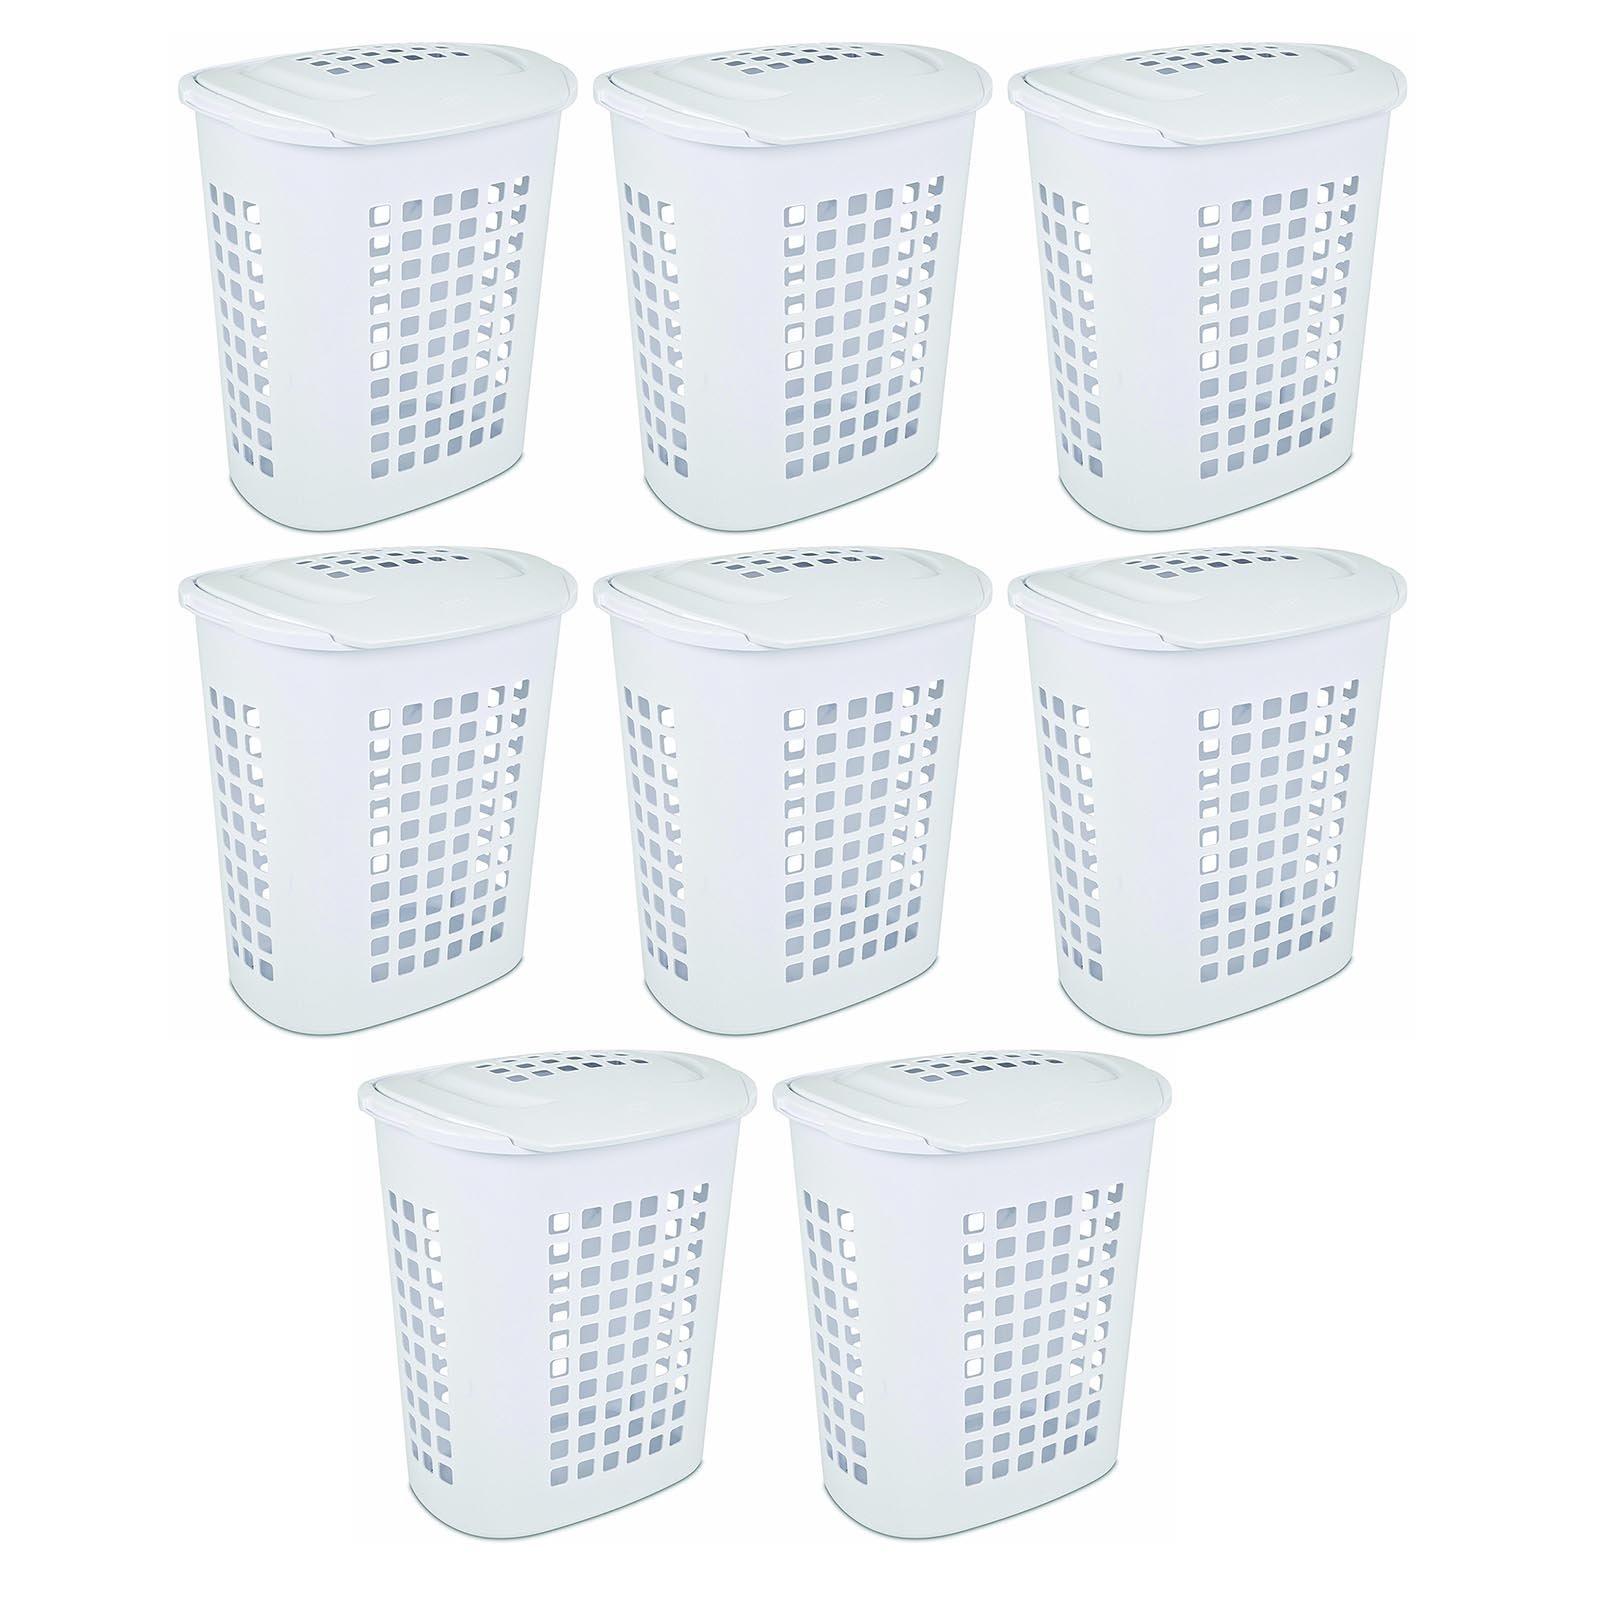 Sterilite 2.3 Bushell 81 Liter Lift Top XL Laundry Basket Hamper, White (8 Pack)